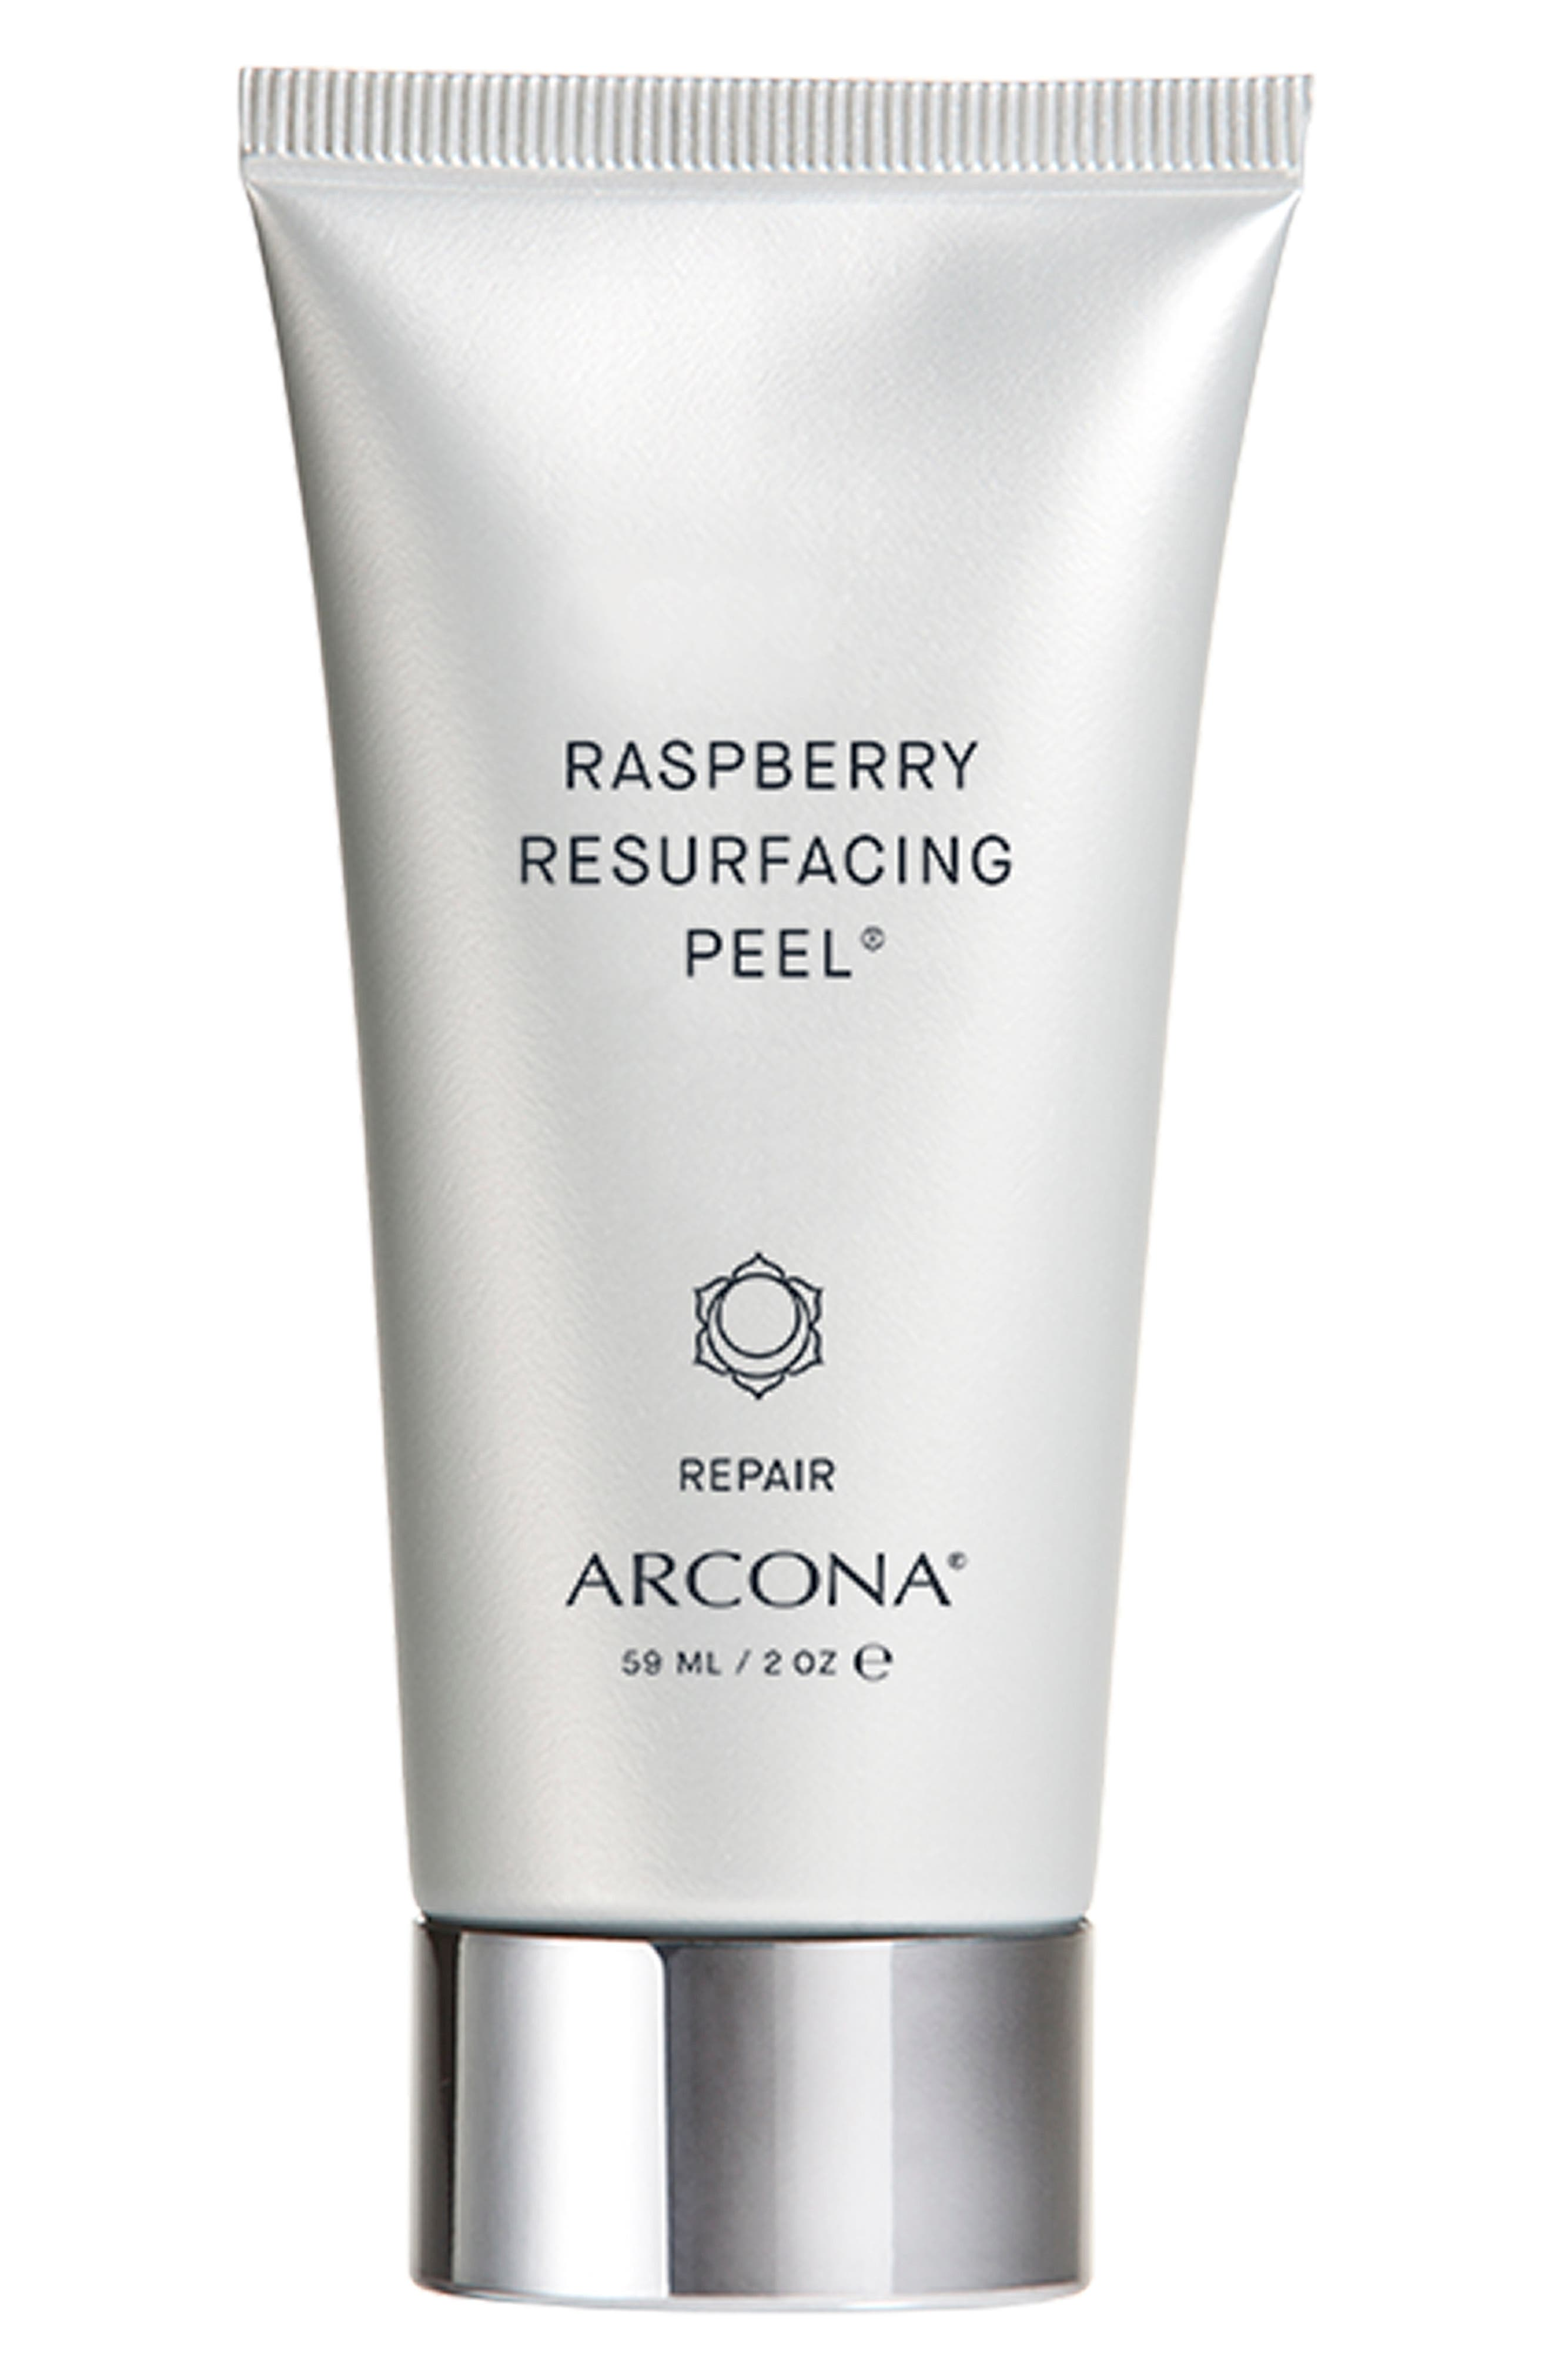 Raspberry Resurfacing Peel